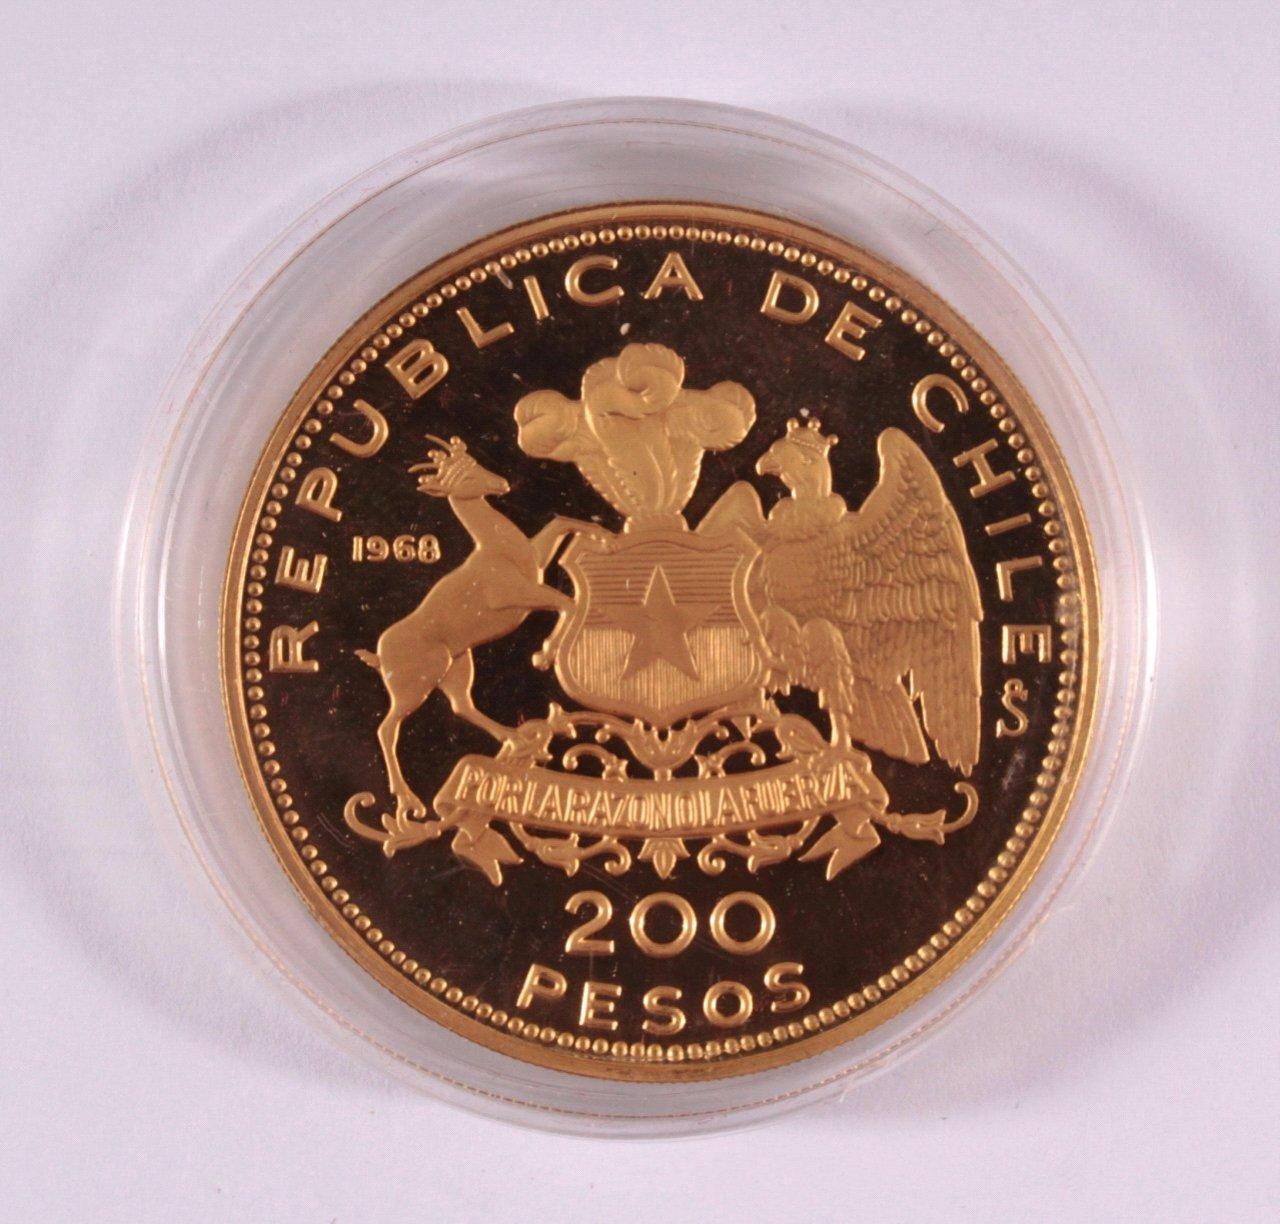 200 Pesos Chile 1968-1